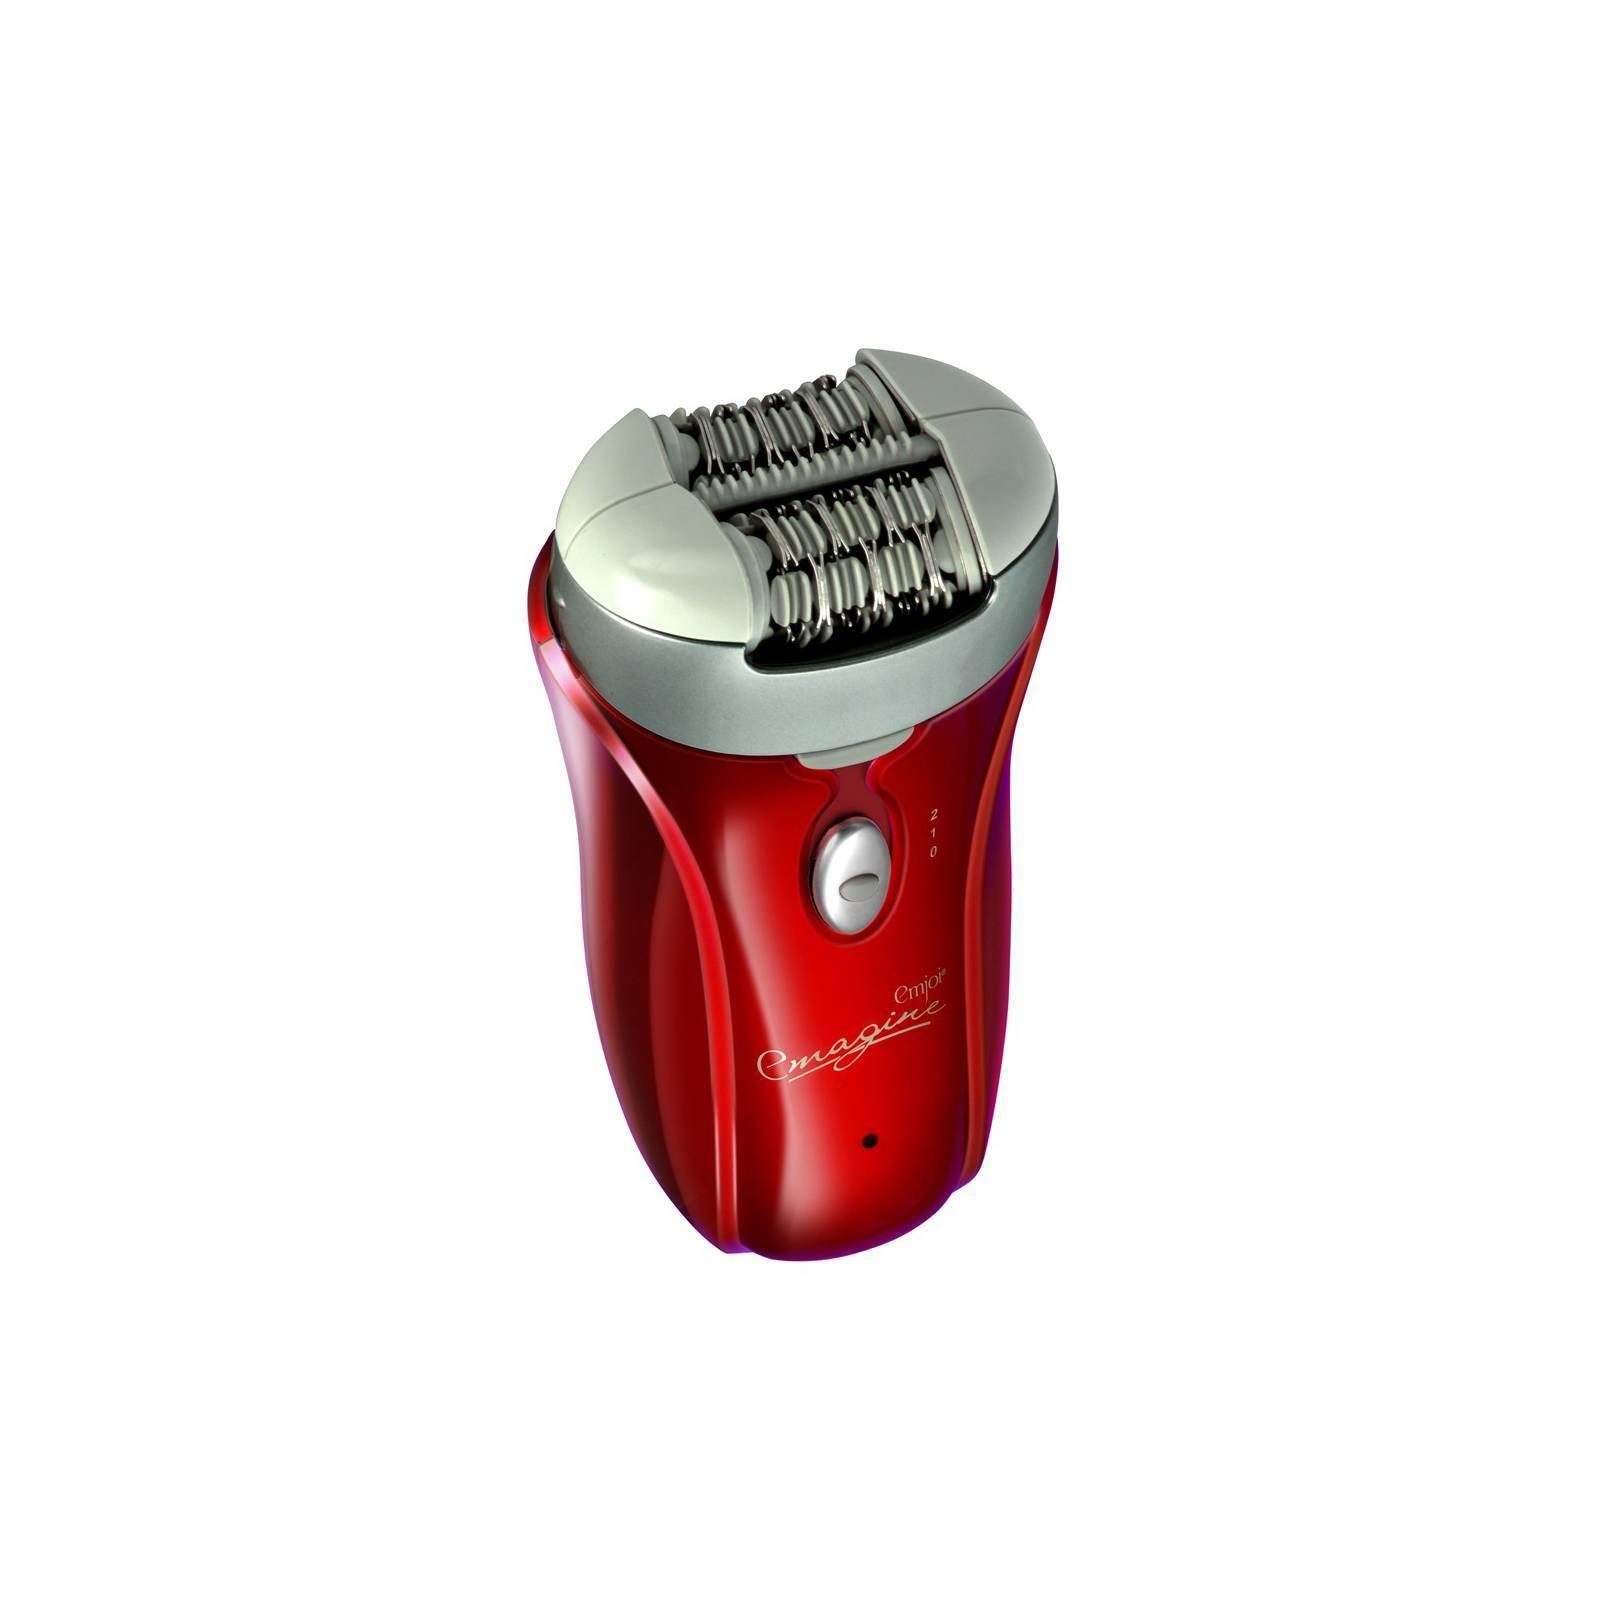 Emjoi Emagine 72 Tweezer Head Epilator Model Ap 18 Ebay Philips Bre630 Electric Lady Shaver Shaving Wet And Dry Dual Stripper Stock Photo